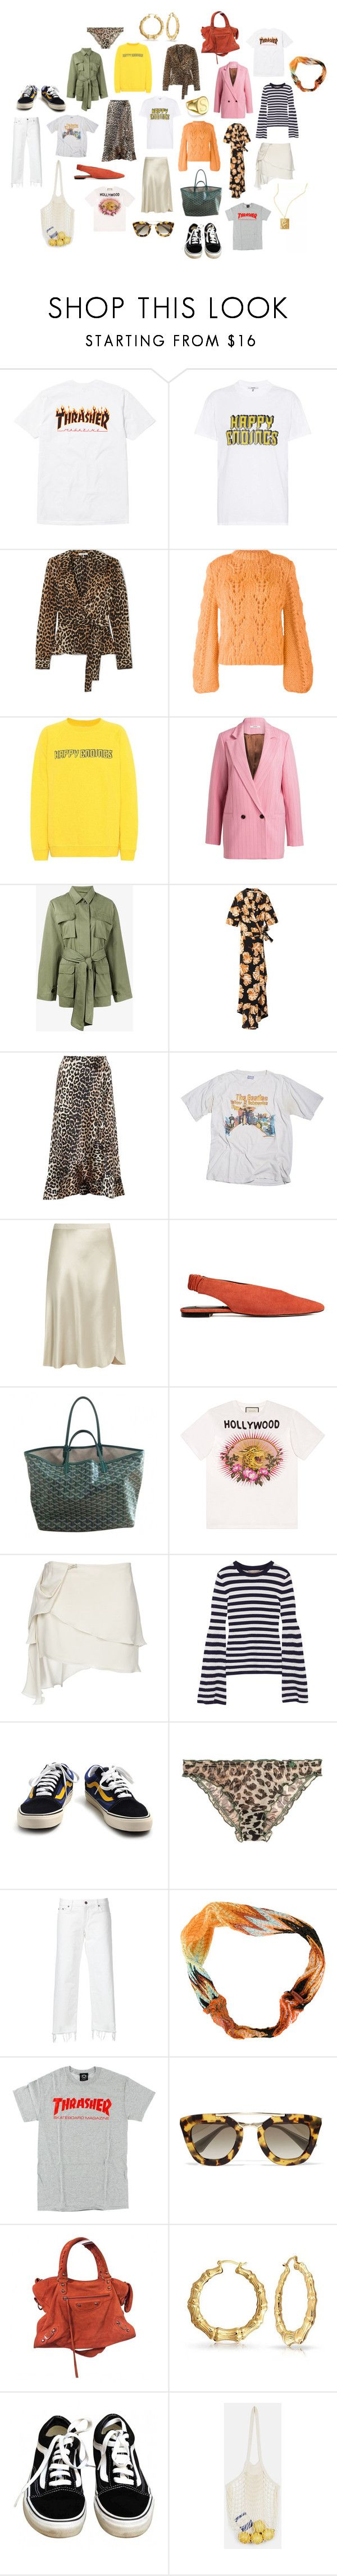 """Untitled #234"" by fashiondisguise on Polyvore featuring Ganni, Nili Lotan, Gucci, Acne Studios, Michael Kors, Vans, LoveStories, Simon Miller, Missoni and Prada"